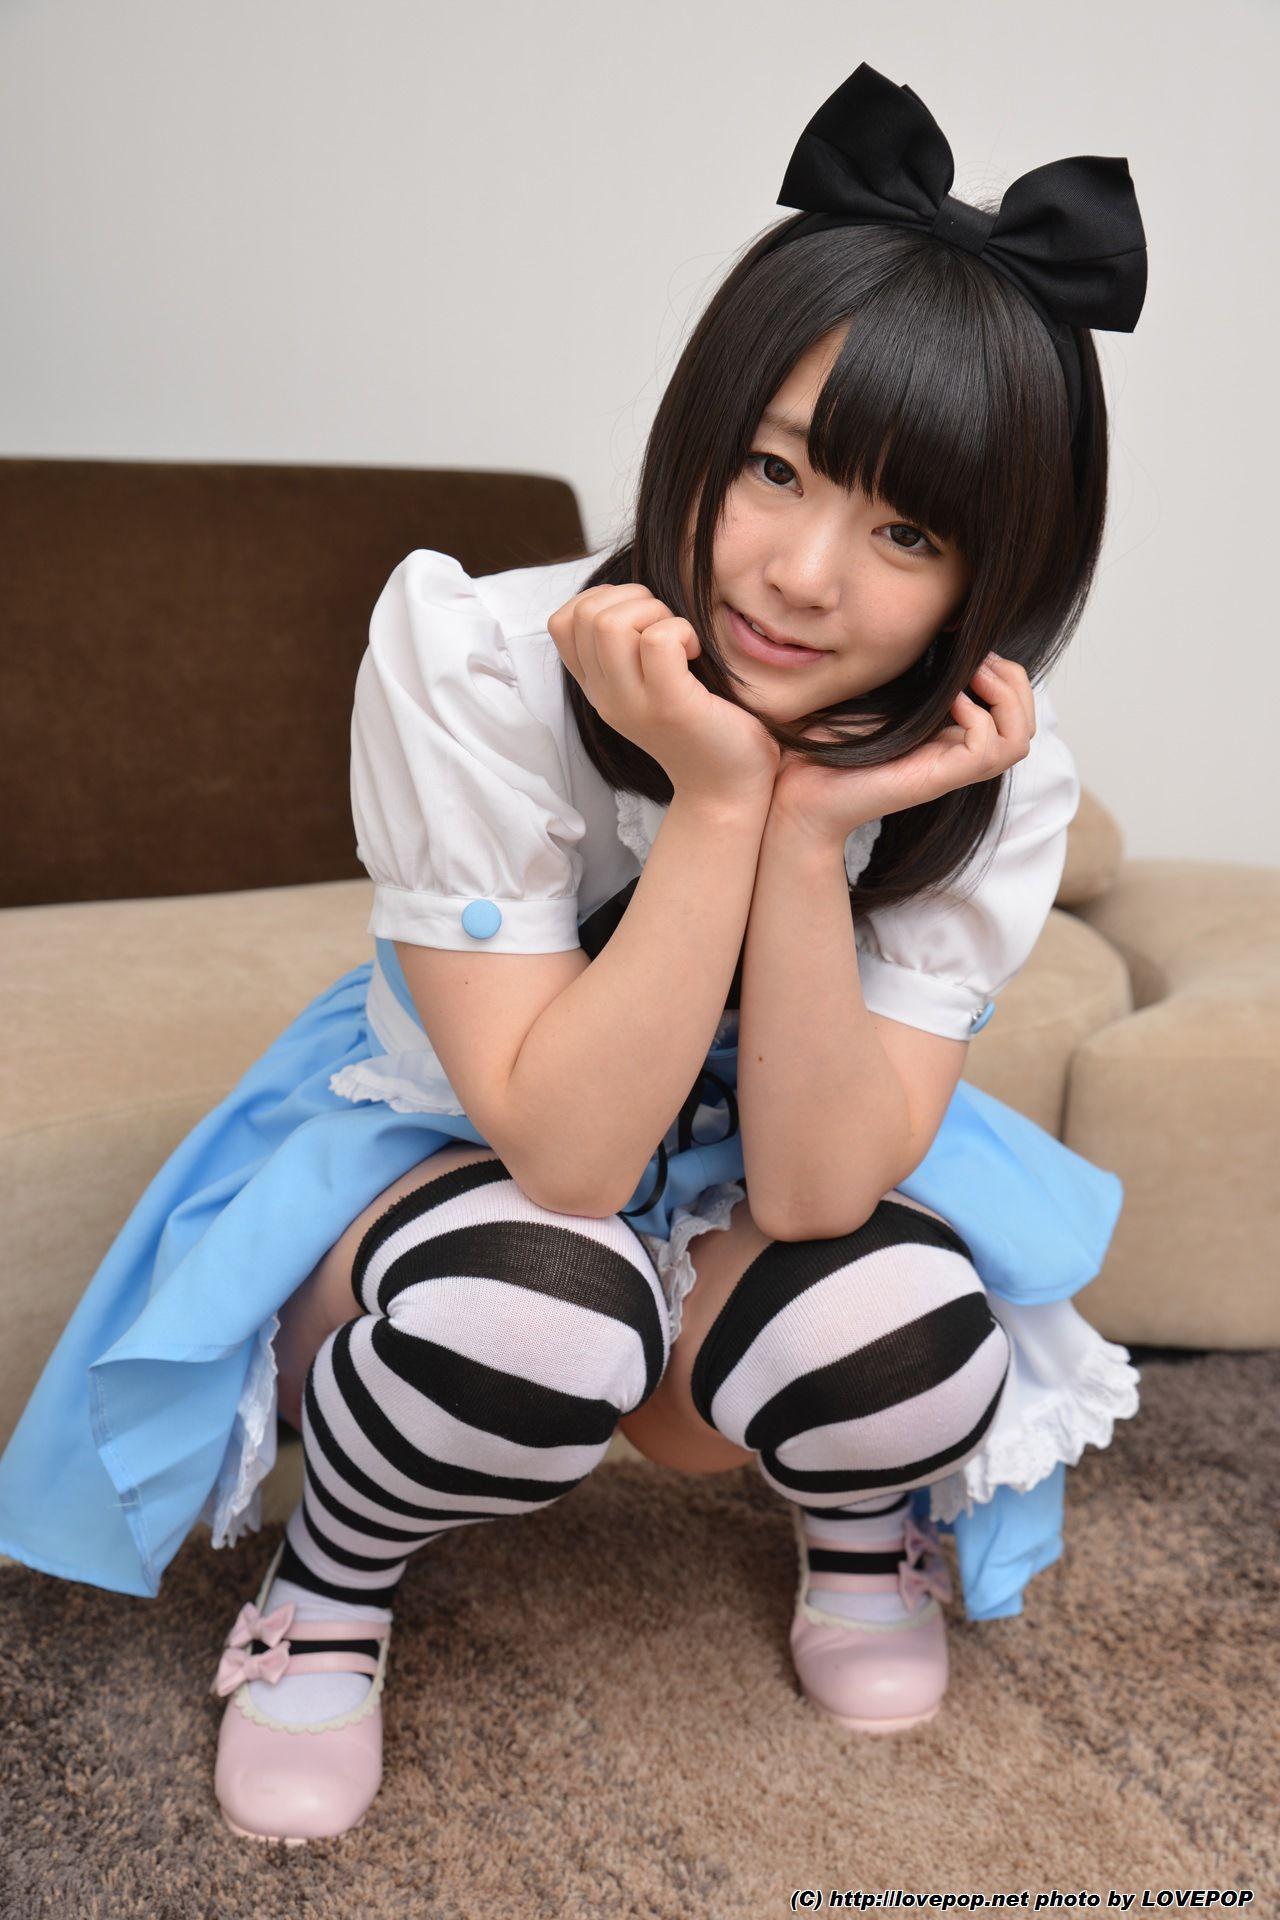 [LovePop] Tsuna Kimura 木村つな Maid Set03 写真集[65P]插图(10)